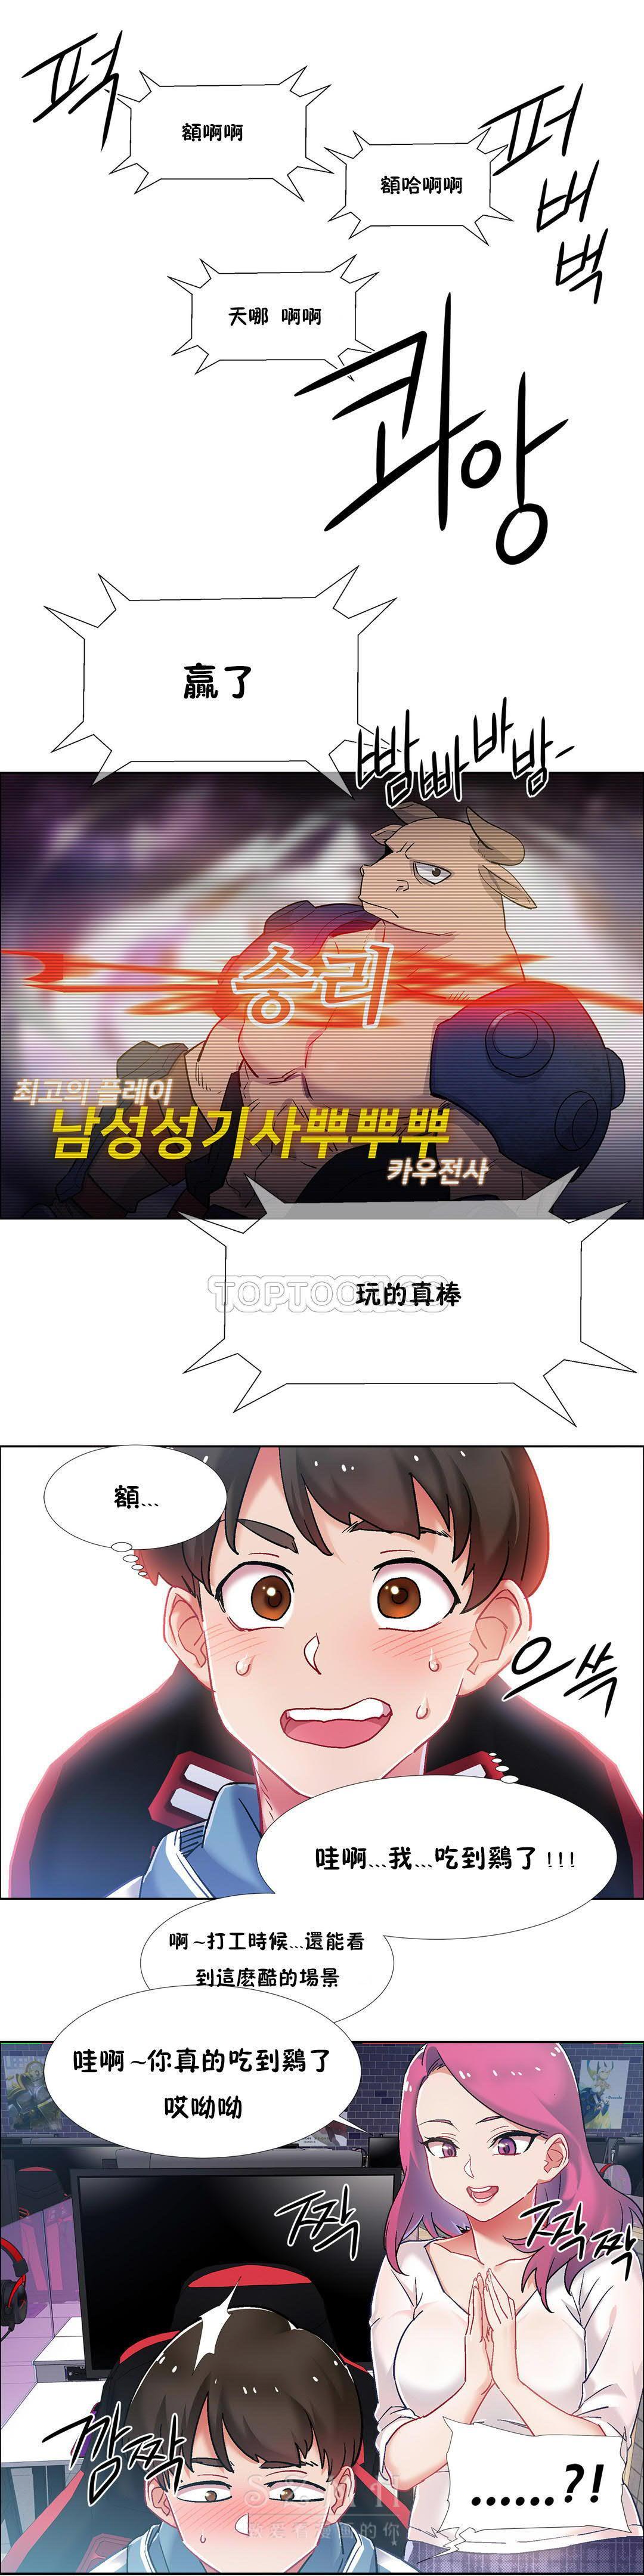 [Studio Wannabe] Rental Girls | 出租女郎 Ch. 33-58 [Chinese]  第二季 完结 18